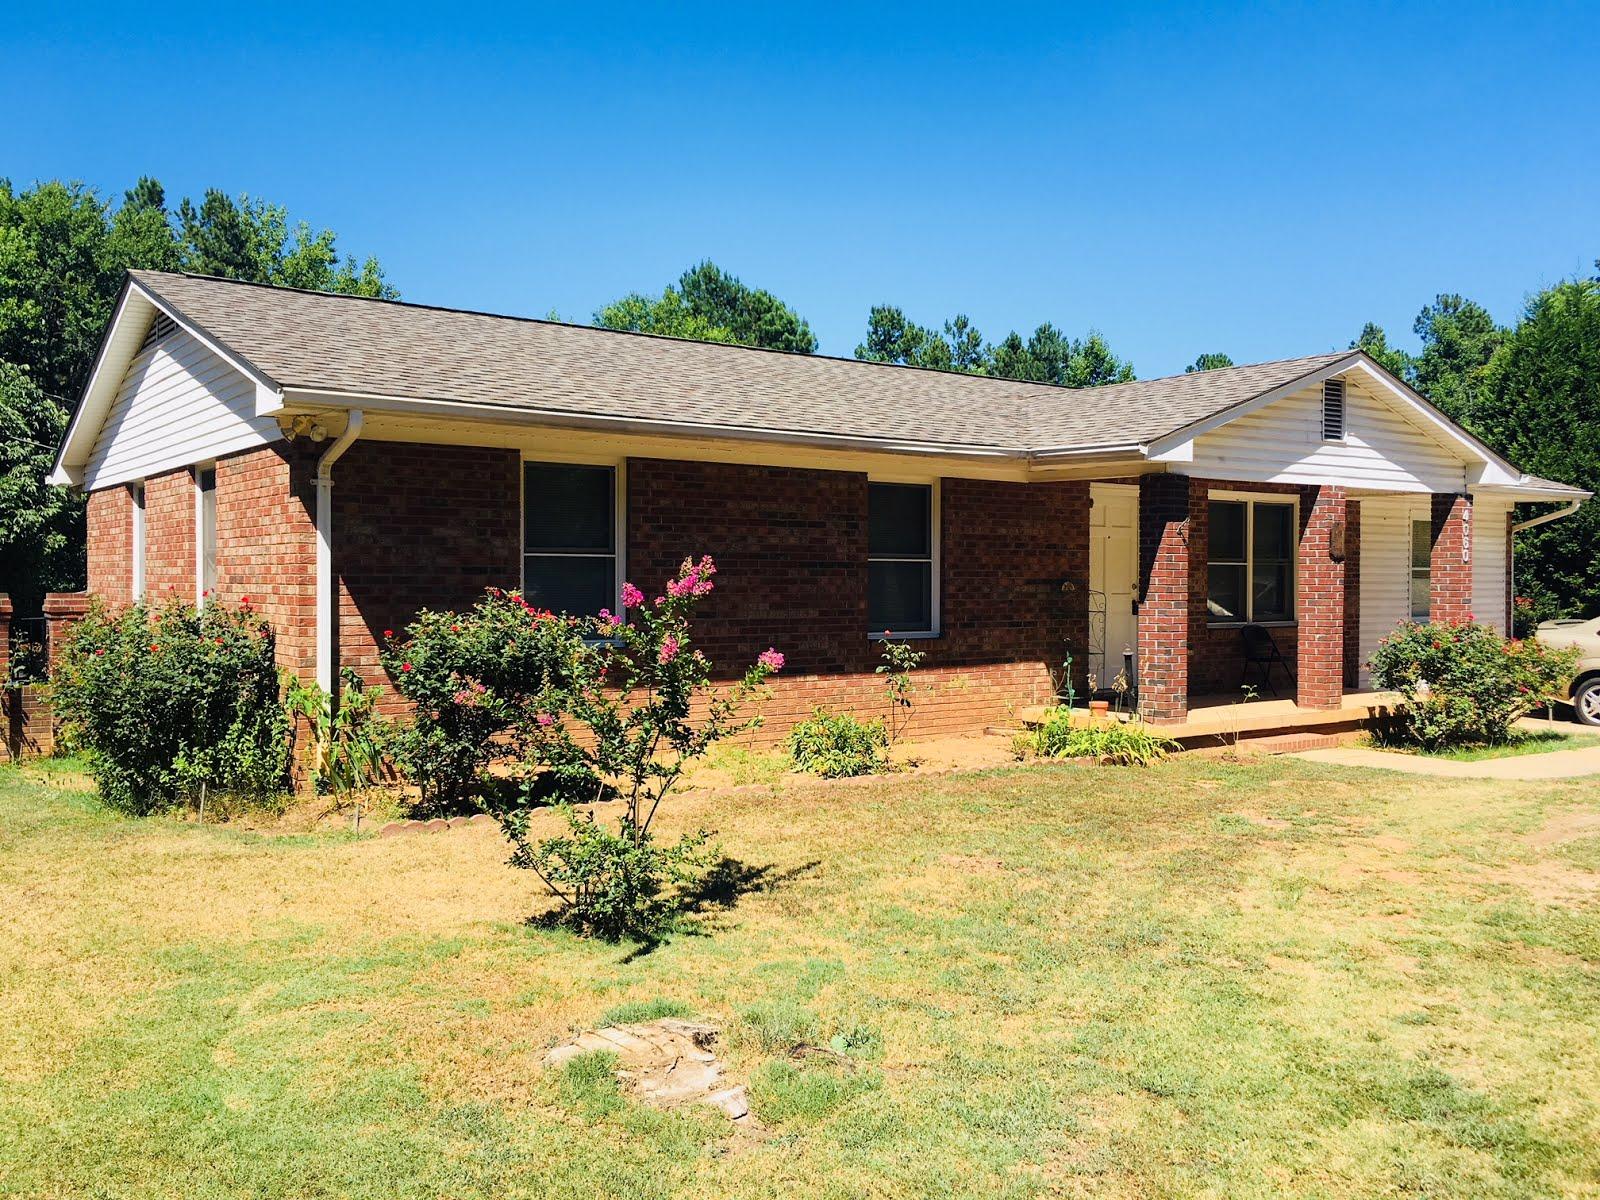 4060 Stokes Ferry Road, Salisbury NC 28146 ~ $132,500